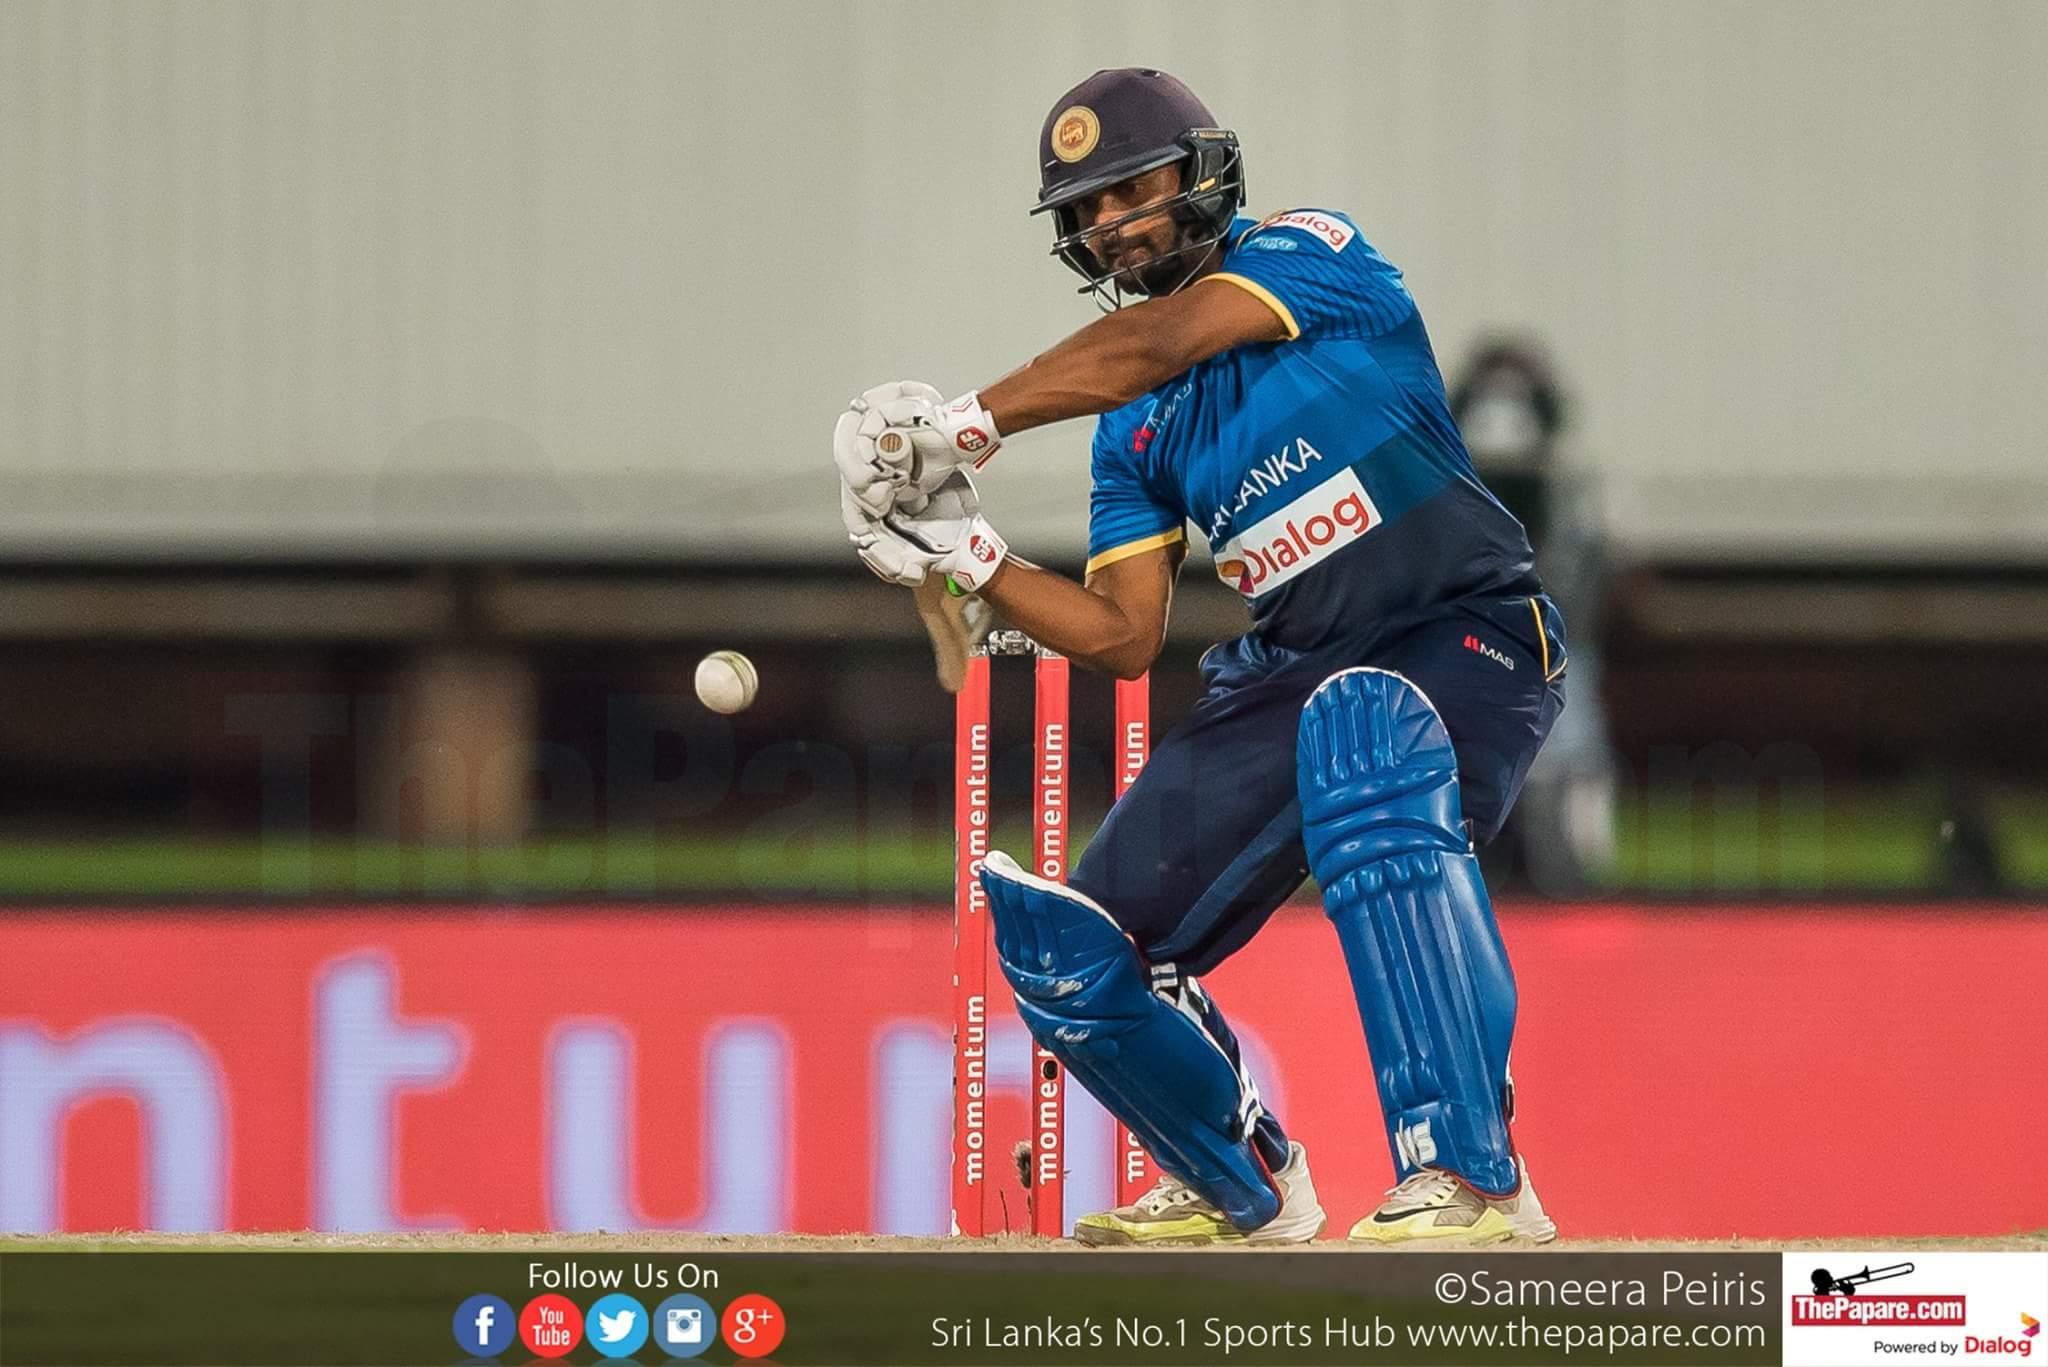 Sri Lanka v South Africa 5th ODI